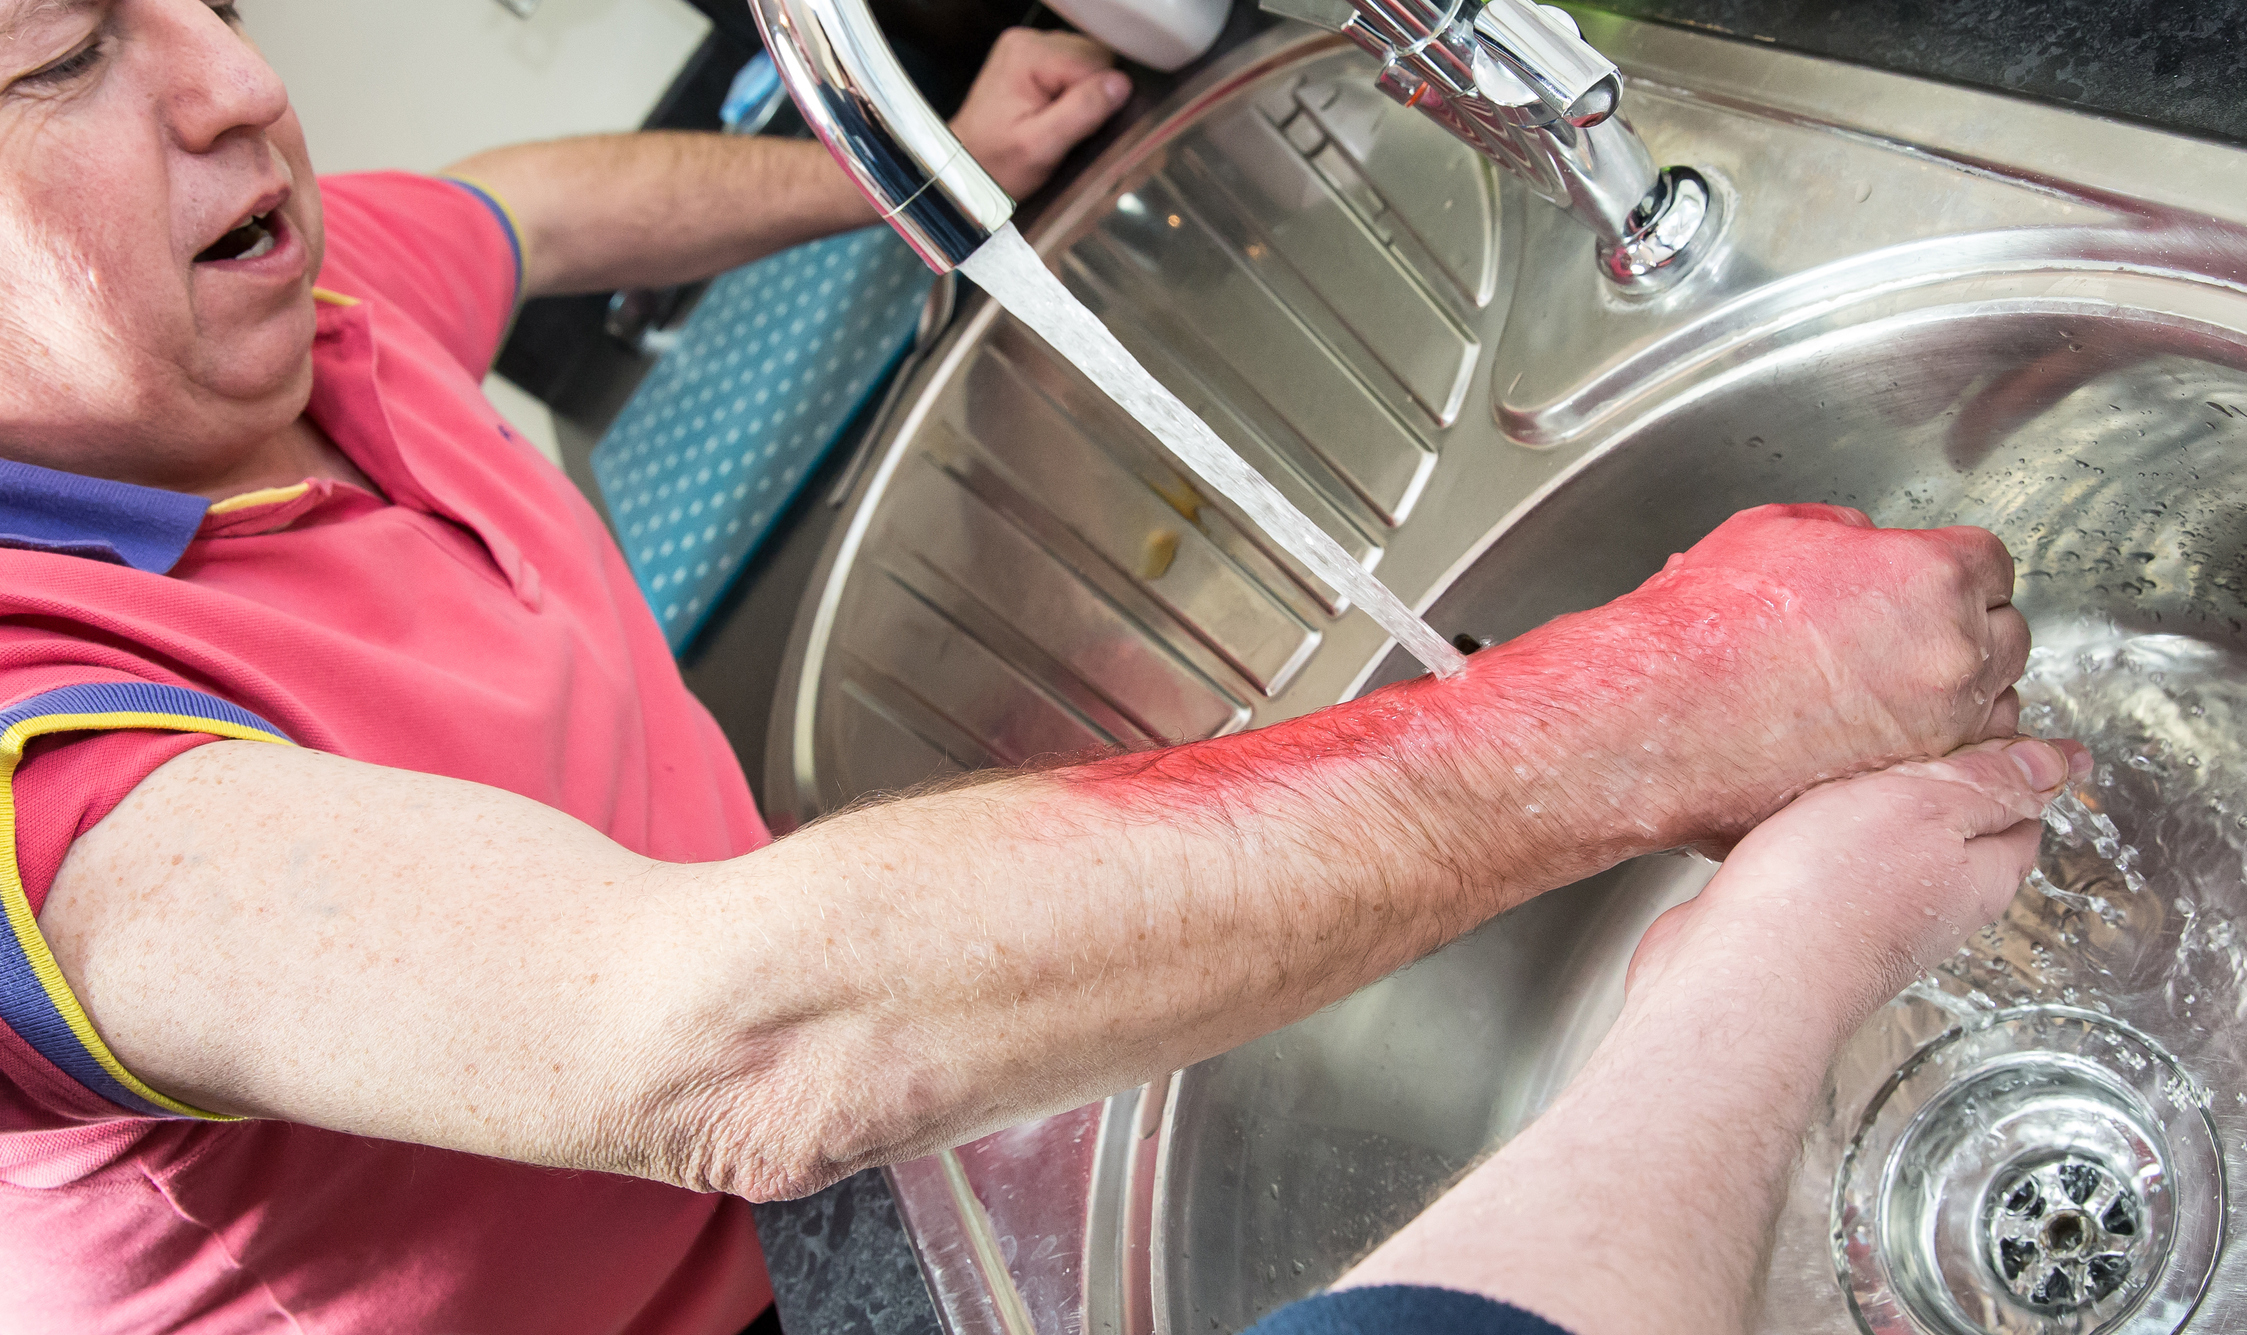 PE0821_scald-injury.jpg